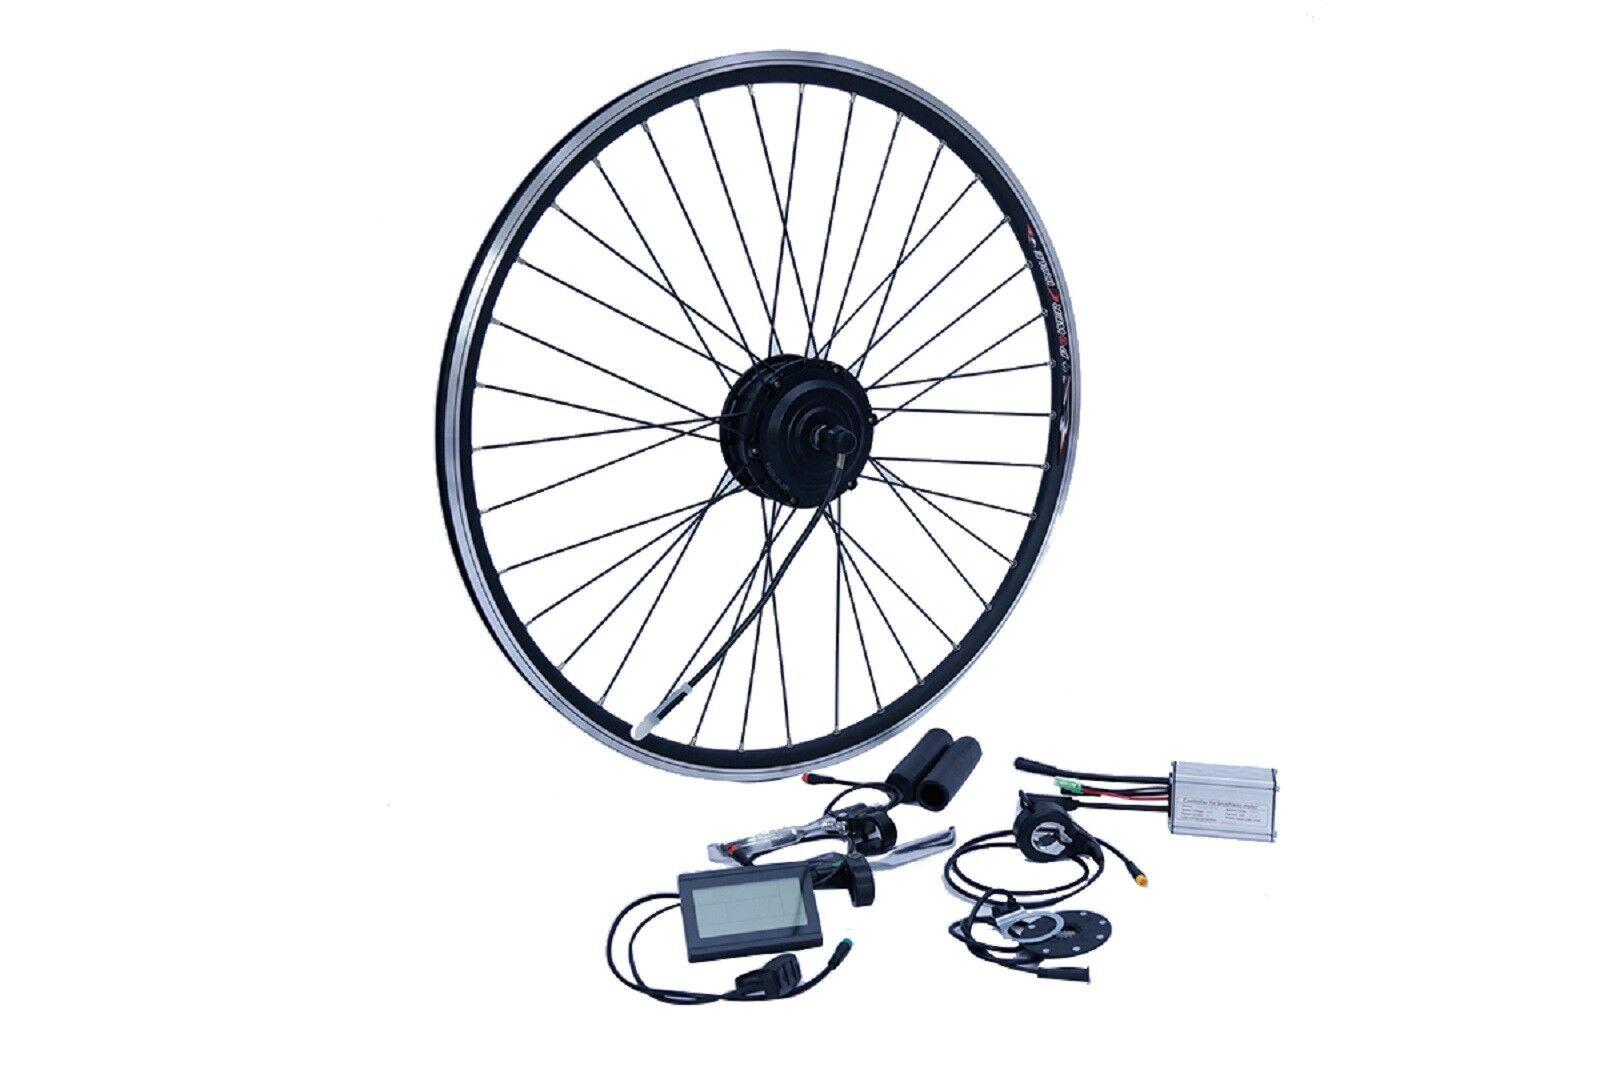 "E-Bike Umbausatz 26"" 8/9/10 Hinterrad RWD 36V 250W Disc Wasserfest IP65 1-Kabel"